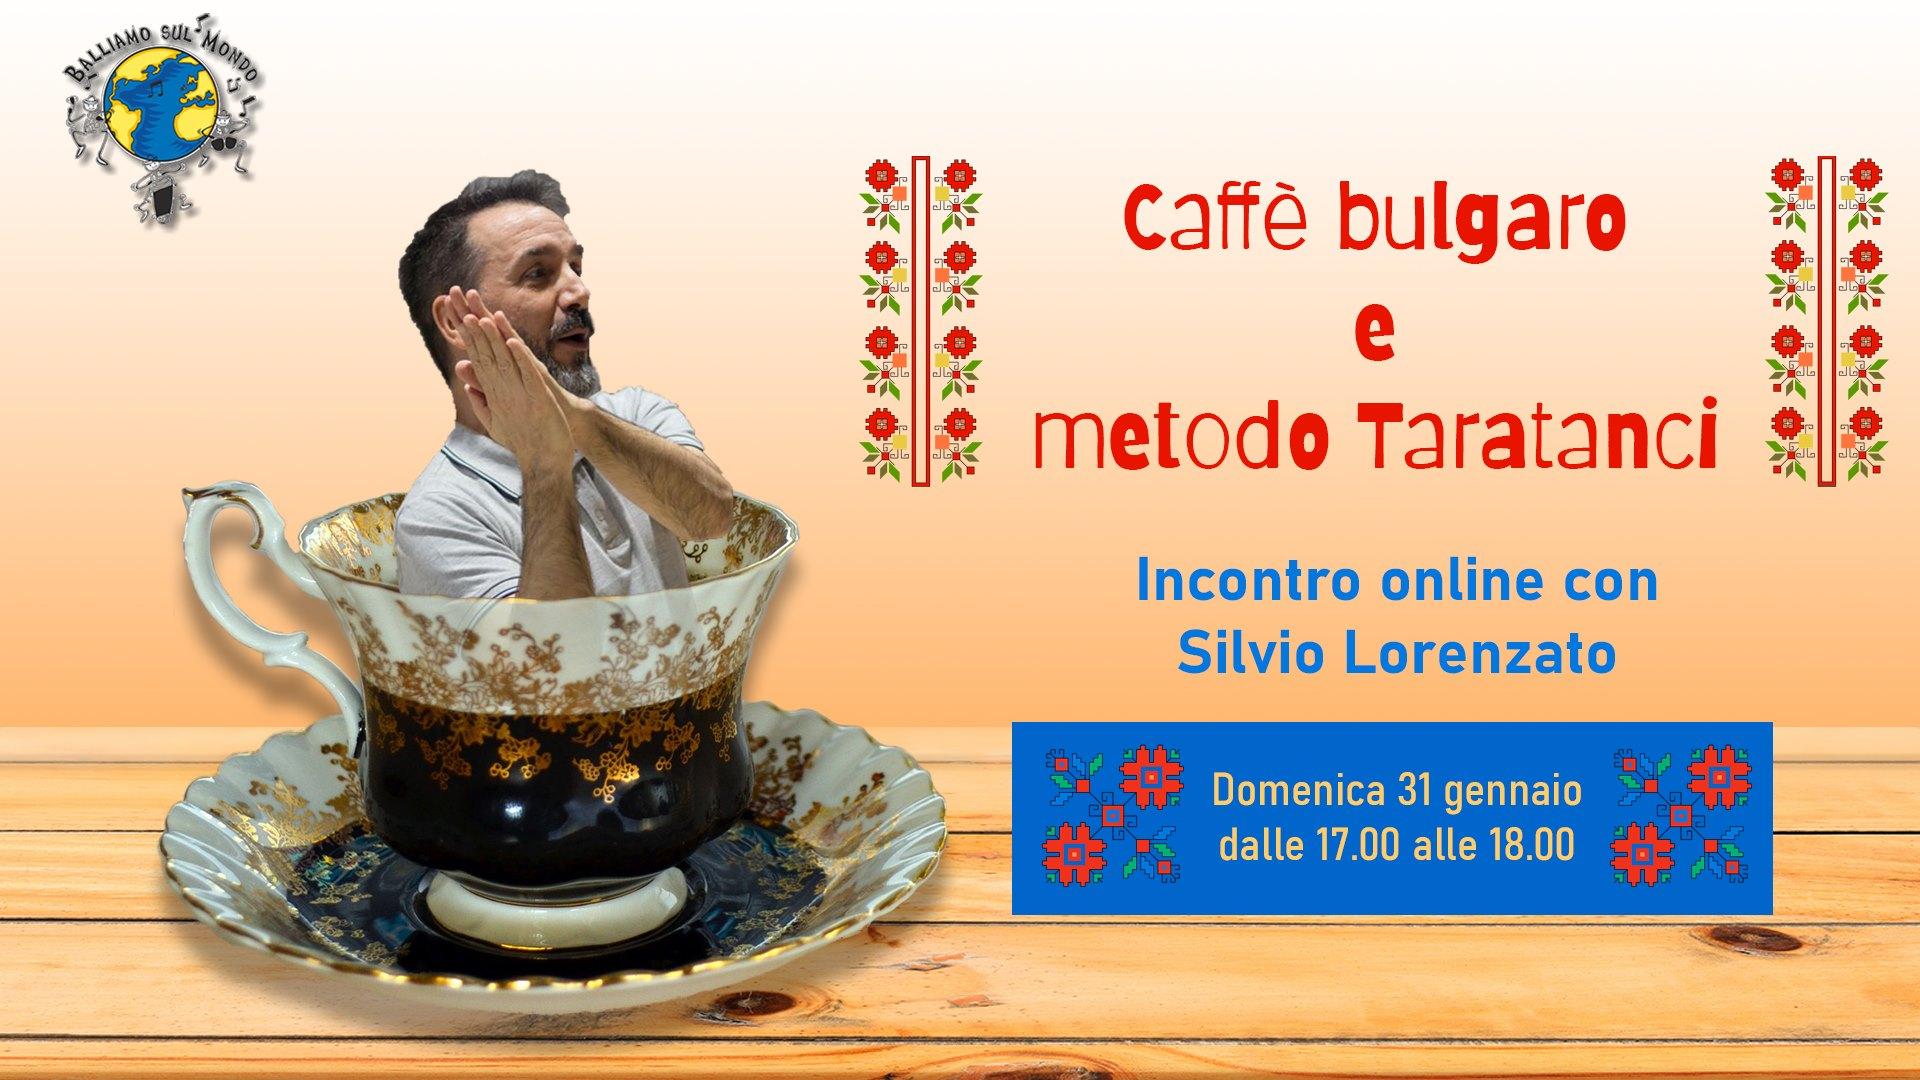 https://www.balliamosulmondo.net/stages/caffe-bulgaro-e-metodo-taratanci/